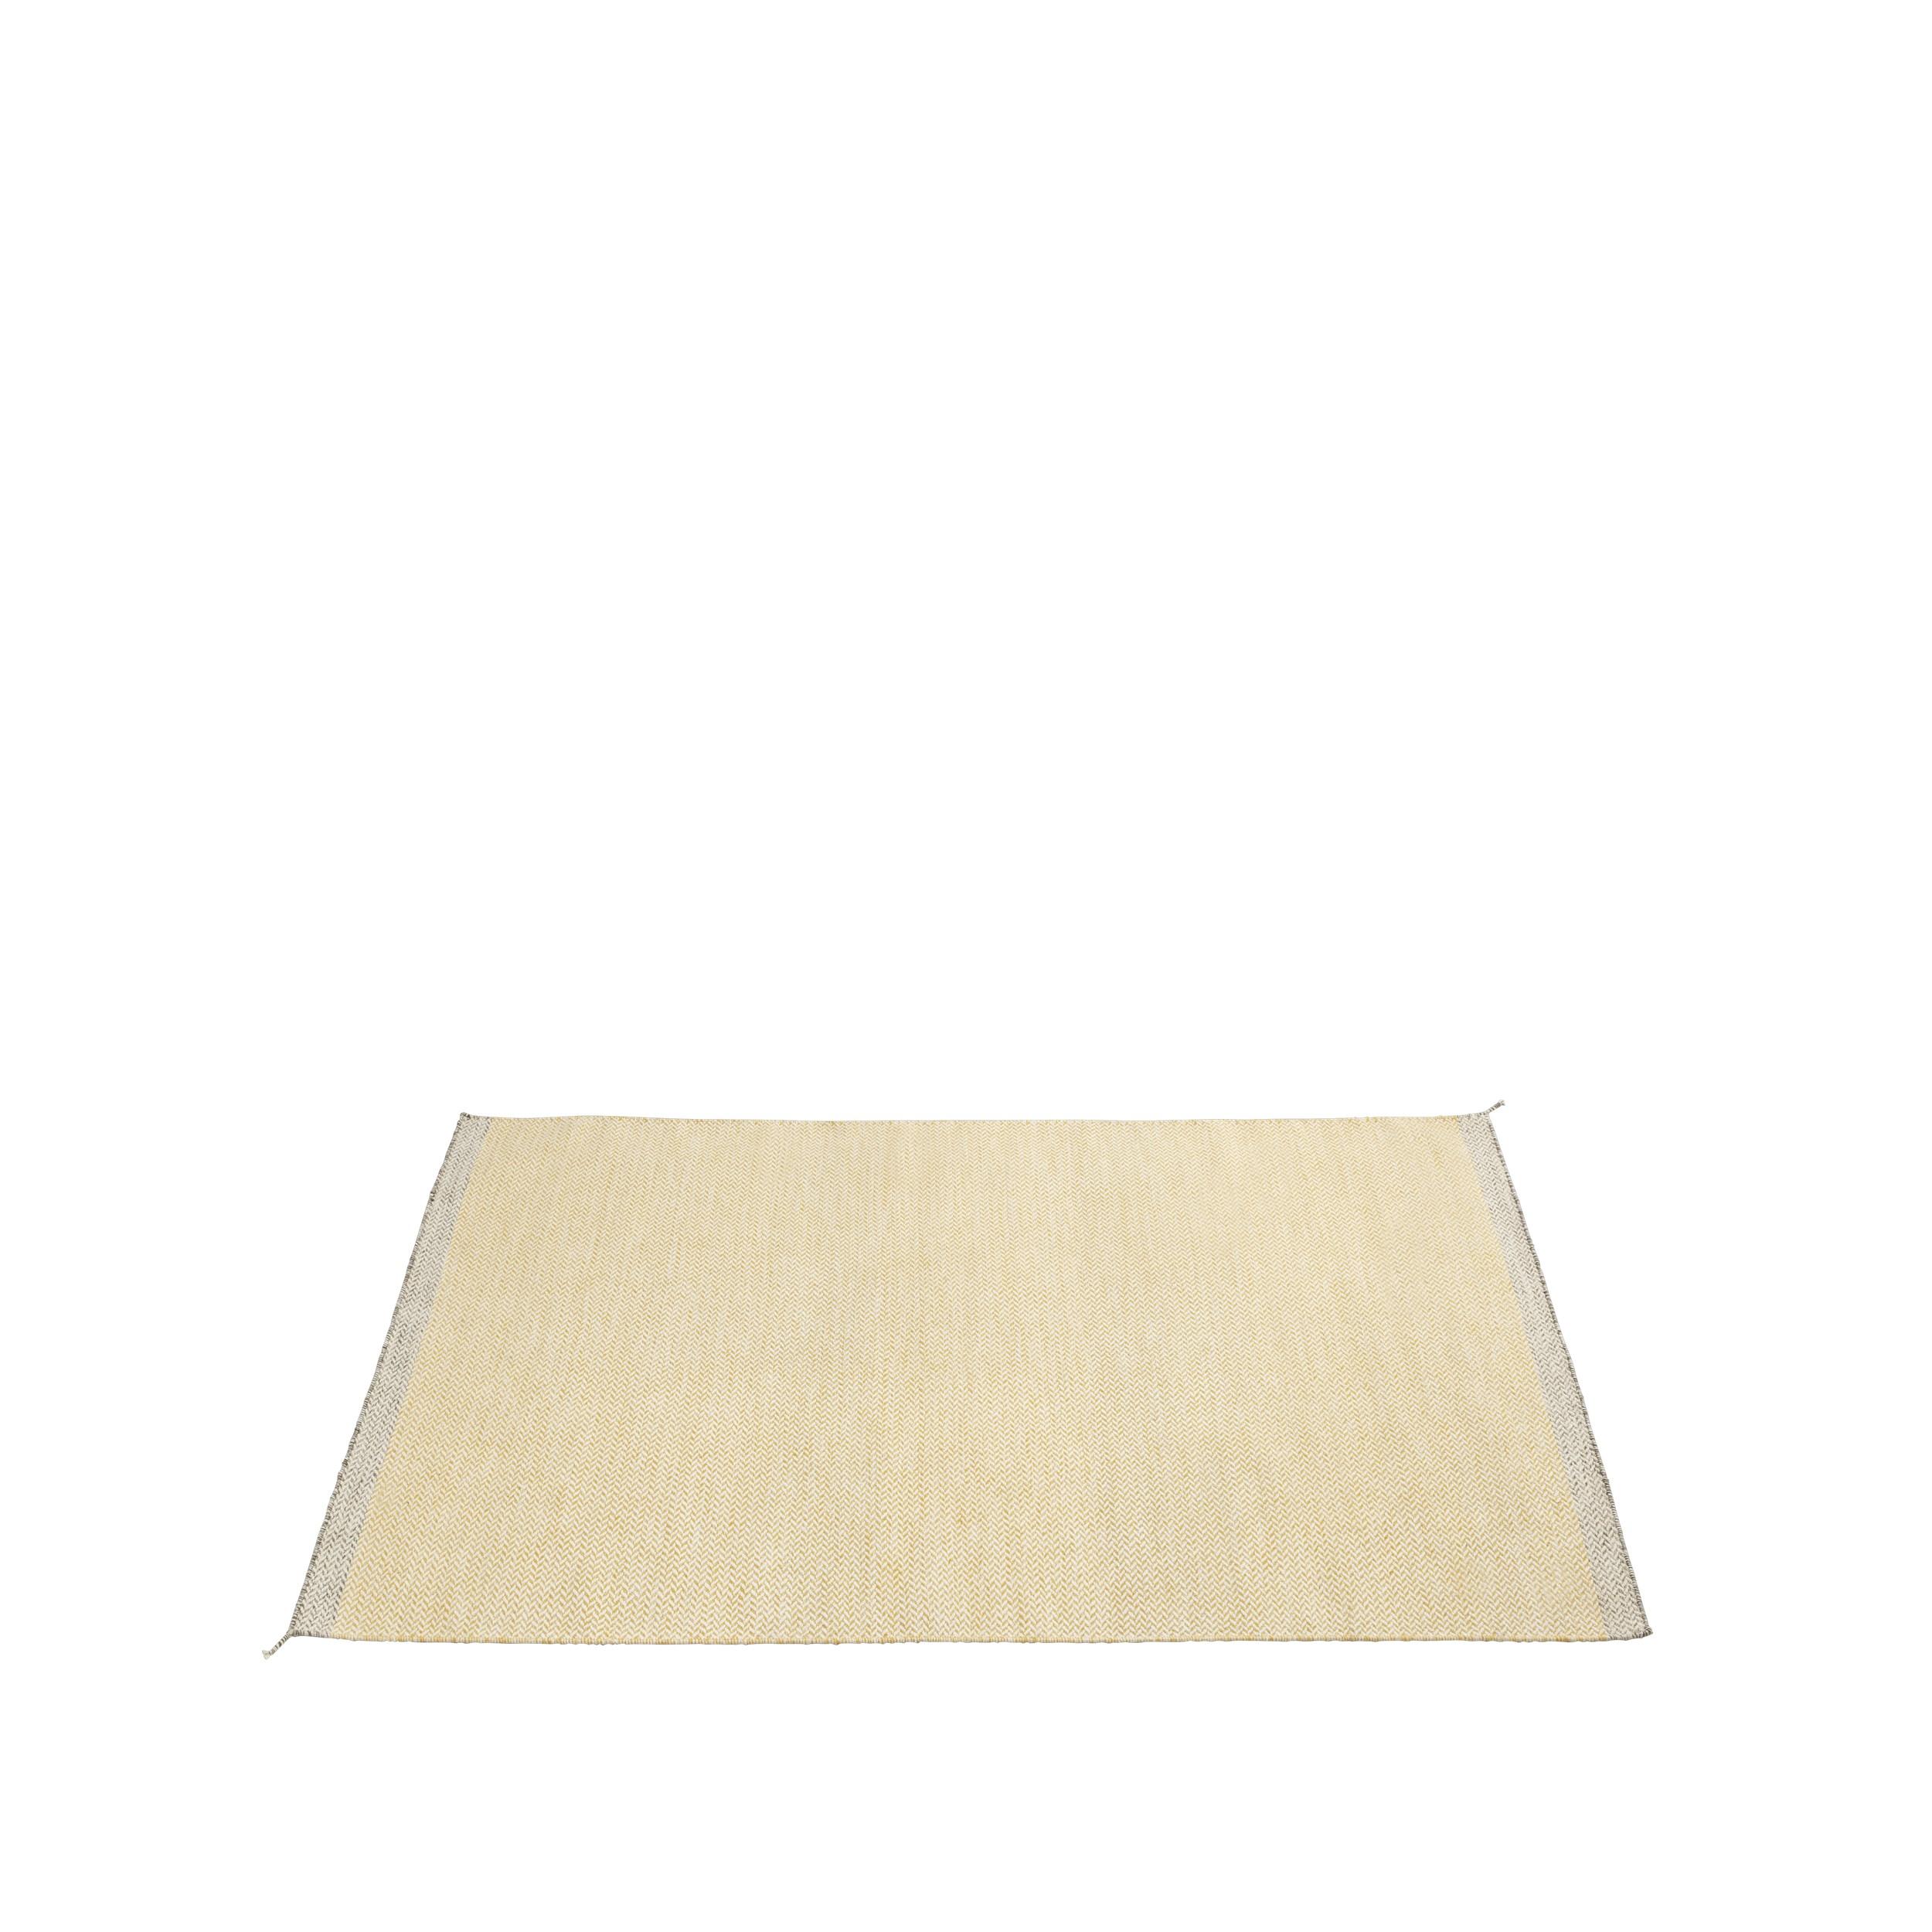 Ply rug 170 x 240 yellow